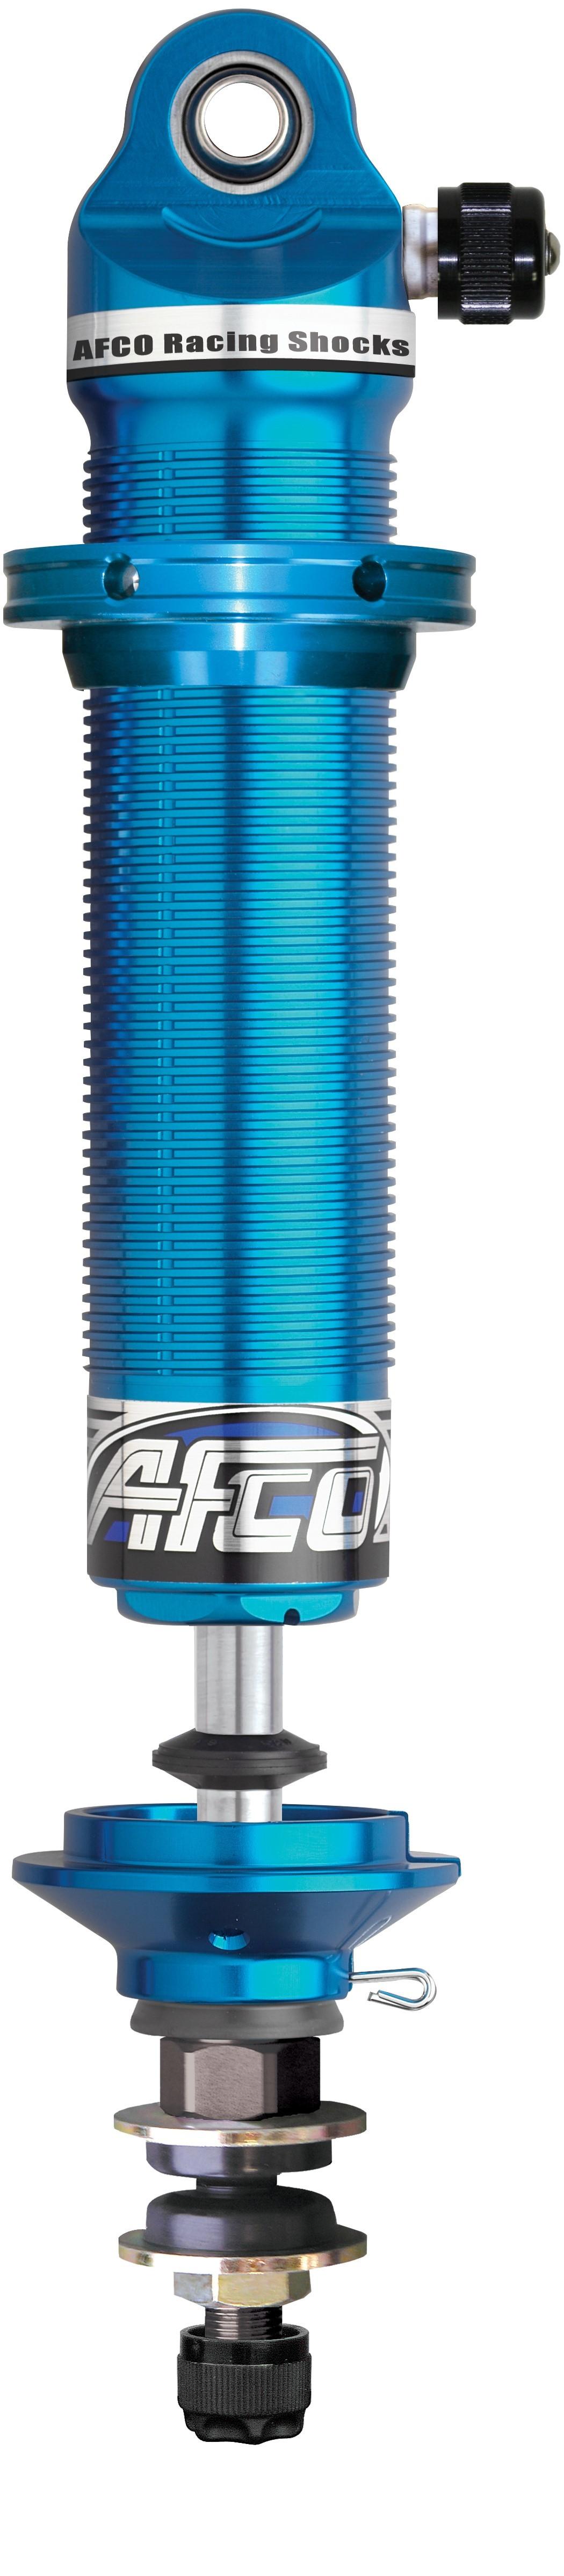 Afco Racing Products Shock Alum 5in Dbl Adj Mopar